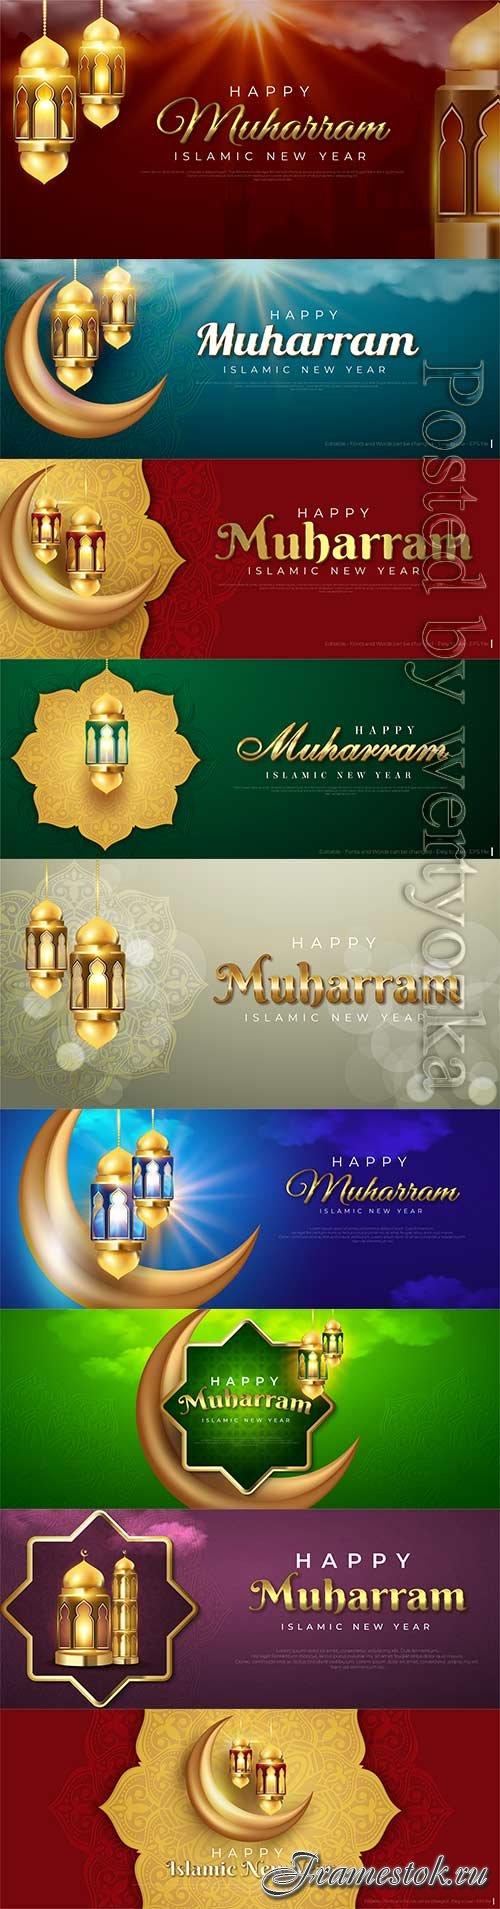 Islamic new year happy muharram celebration banner with islamic golden lantern